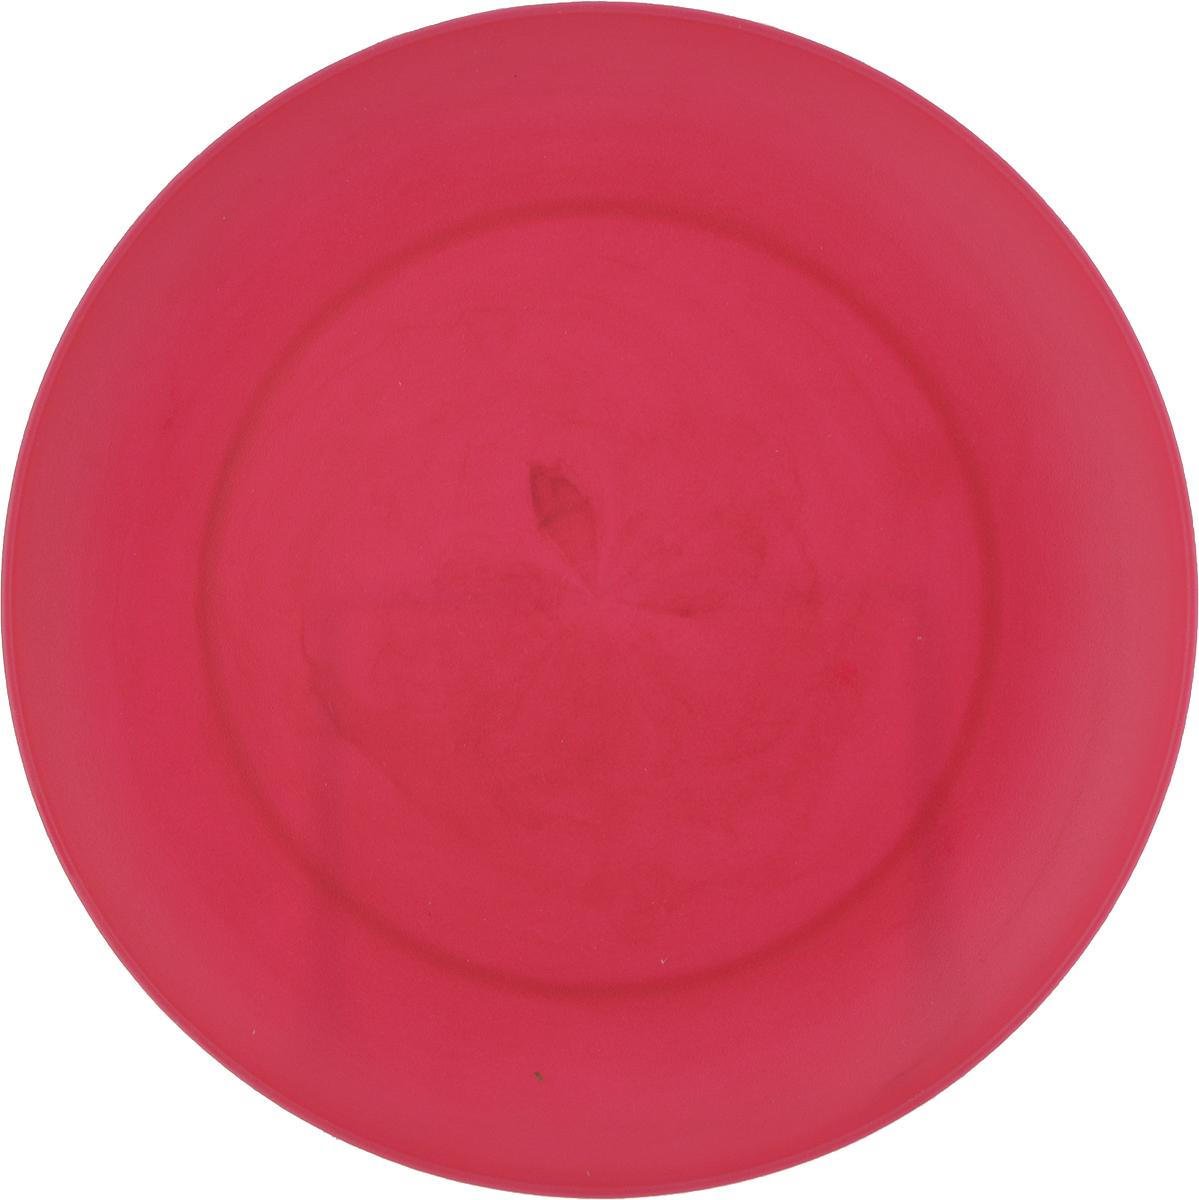 Тарелка Gotoff, цвет: малиновый, диаметр 20,3 смWTC-271_малиновыйТарелка Gotoff, цвет: малиновый, диаметр 20,3 см